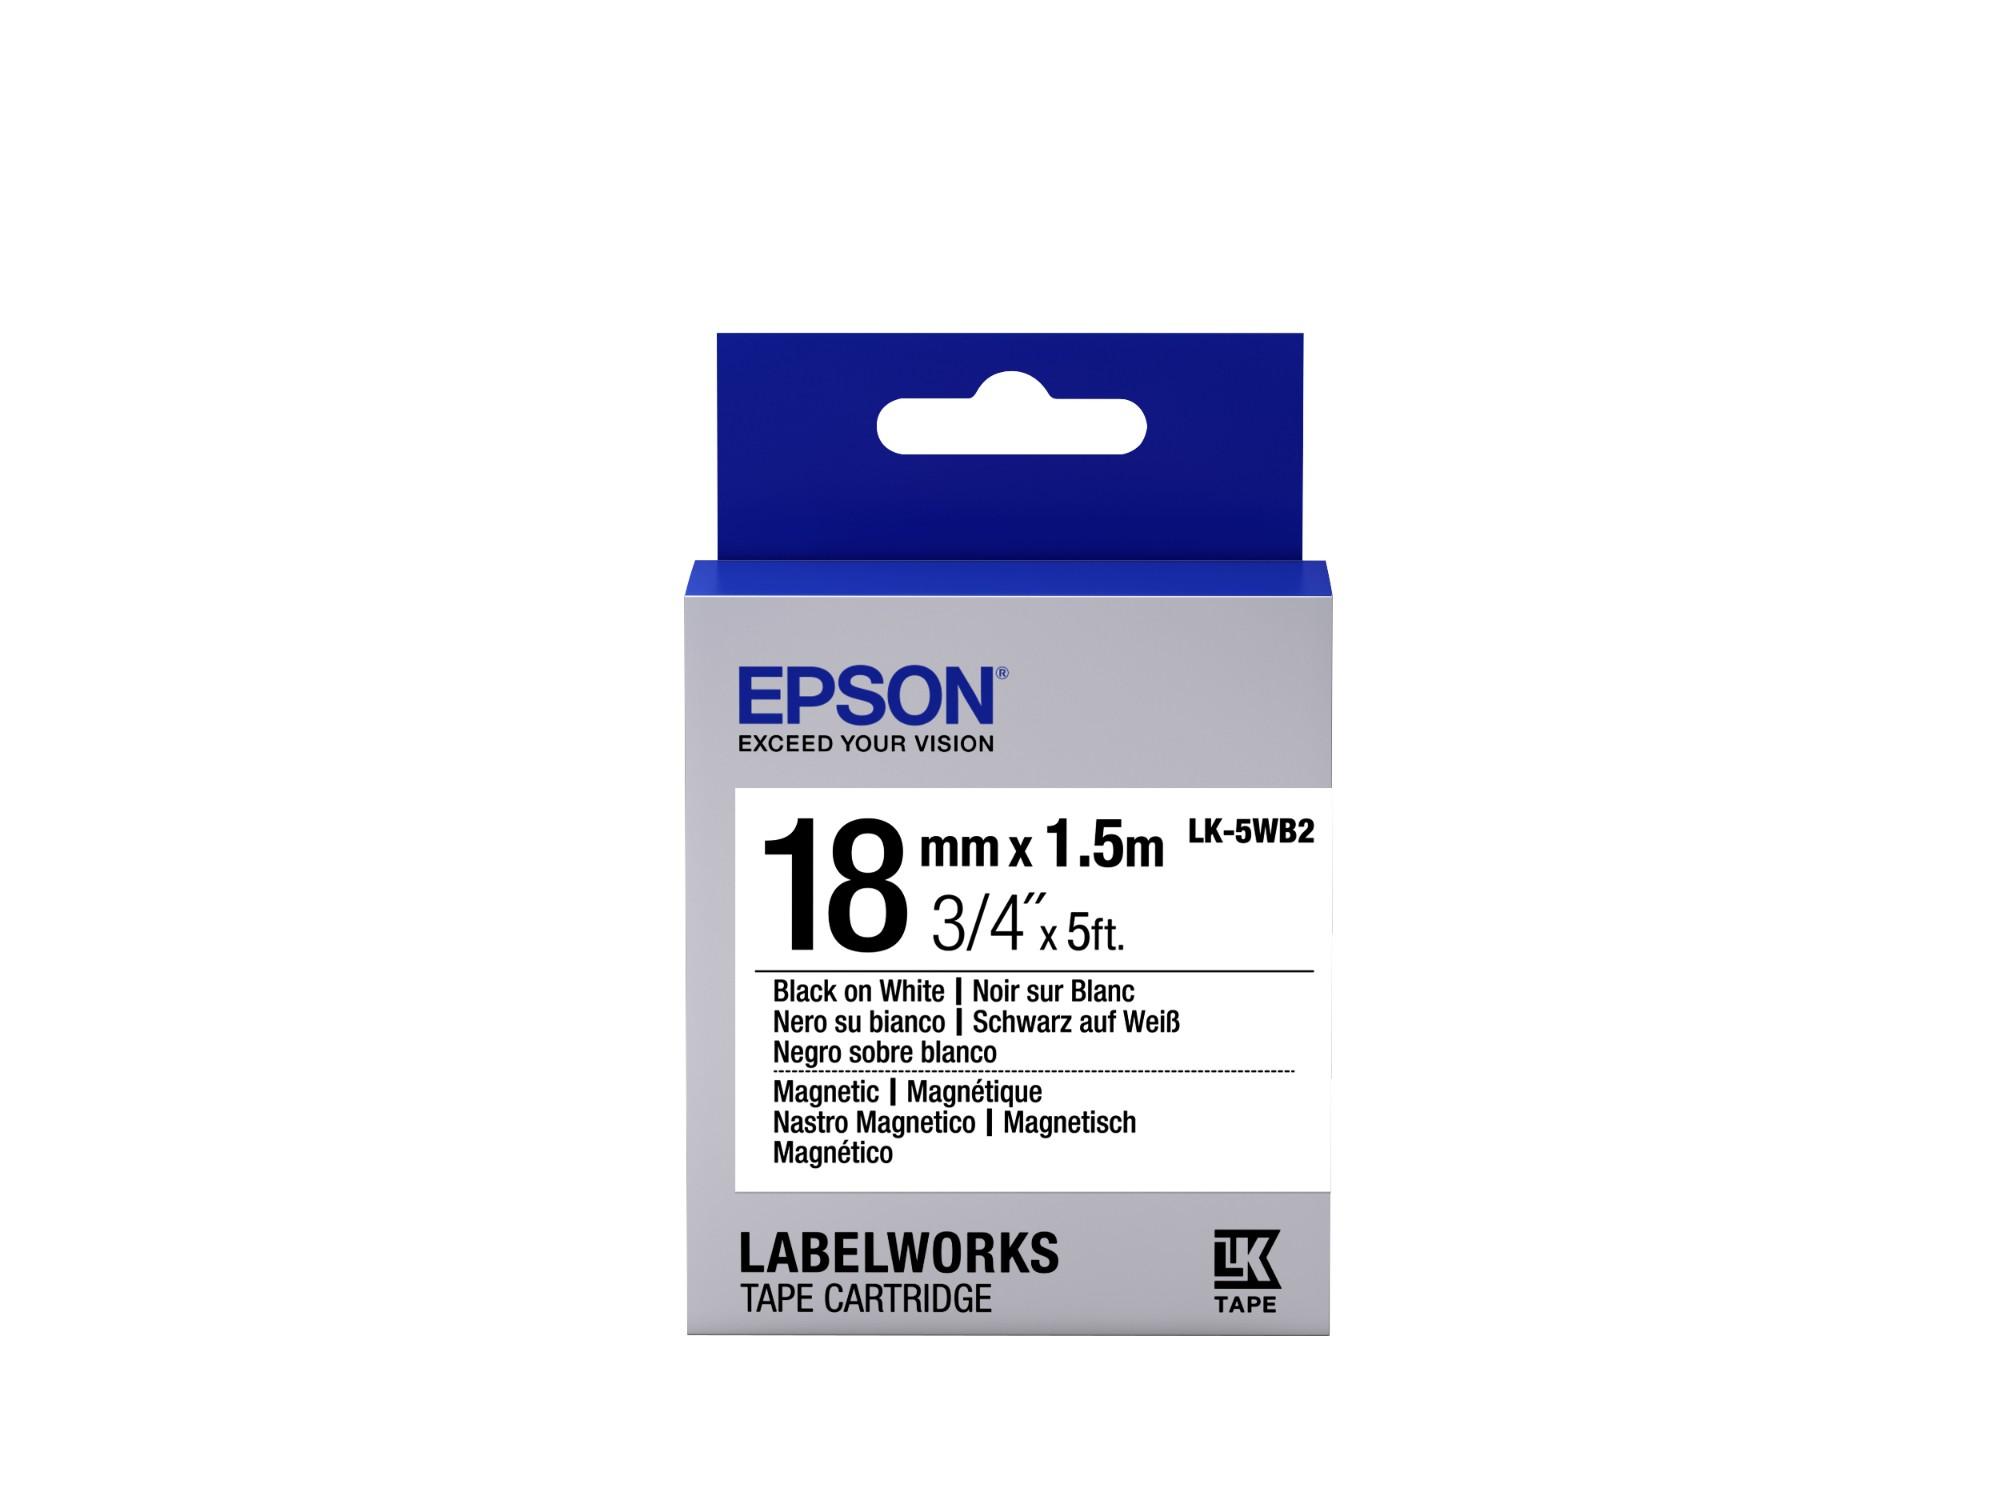 Epson Label Cartridge Magnetic LK-5WB2, zwart/wit 18 mm (1,5 m)